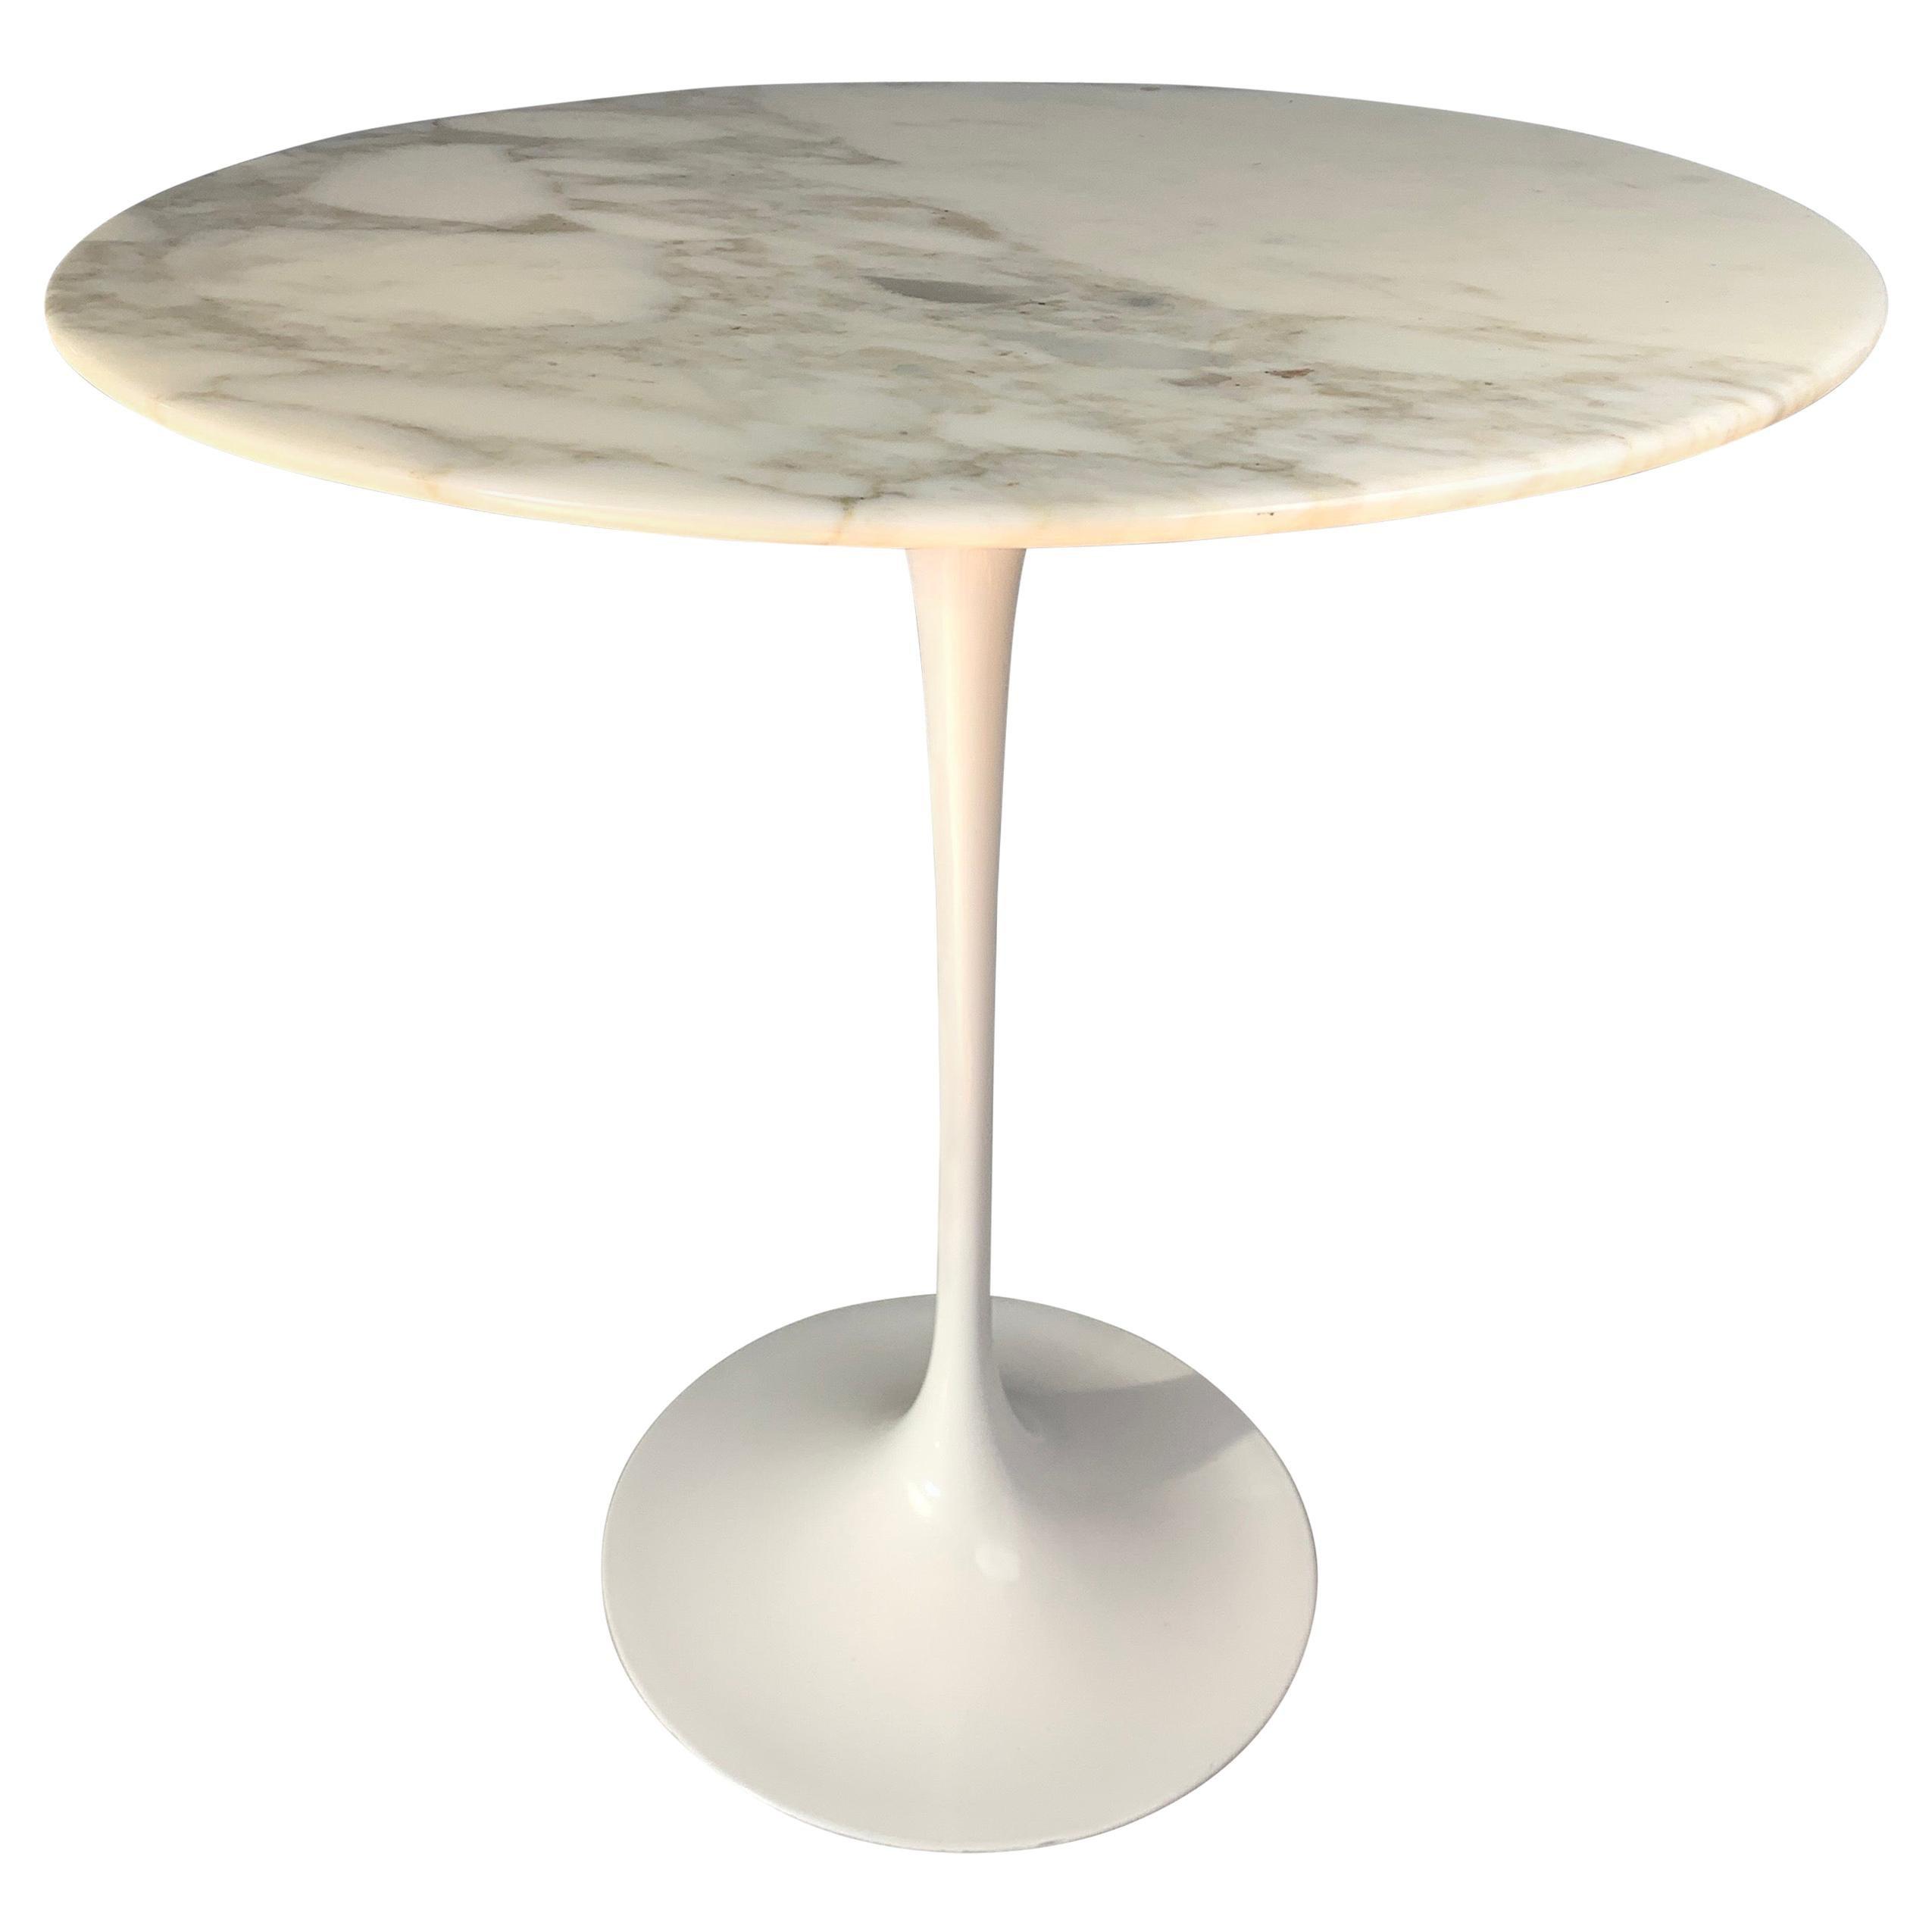 Tulip Side Table by Eero Saarinen for Knoll Studio